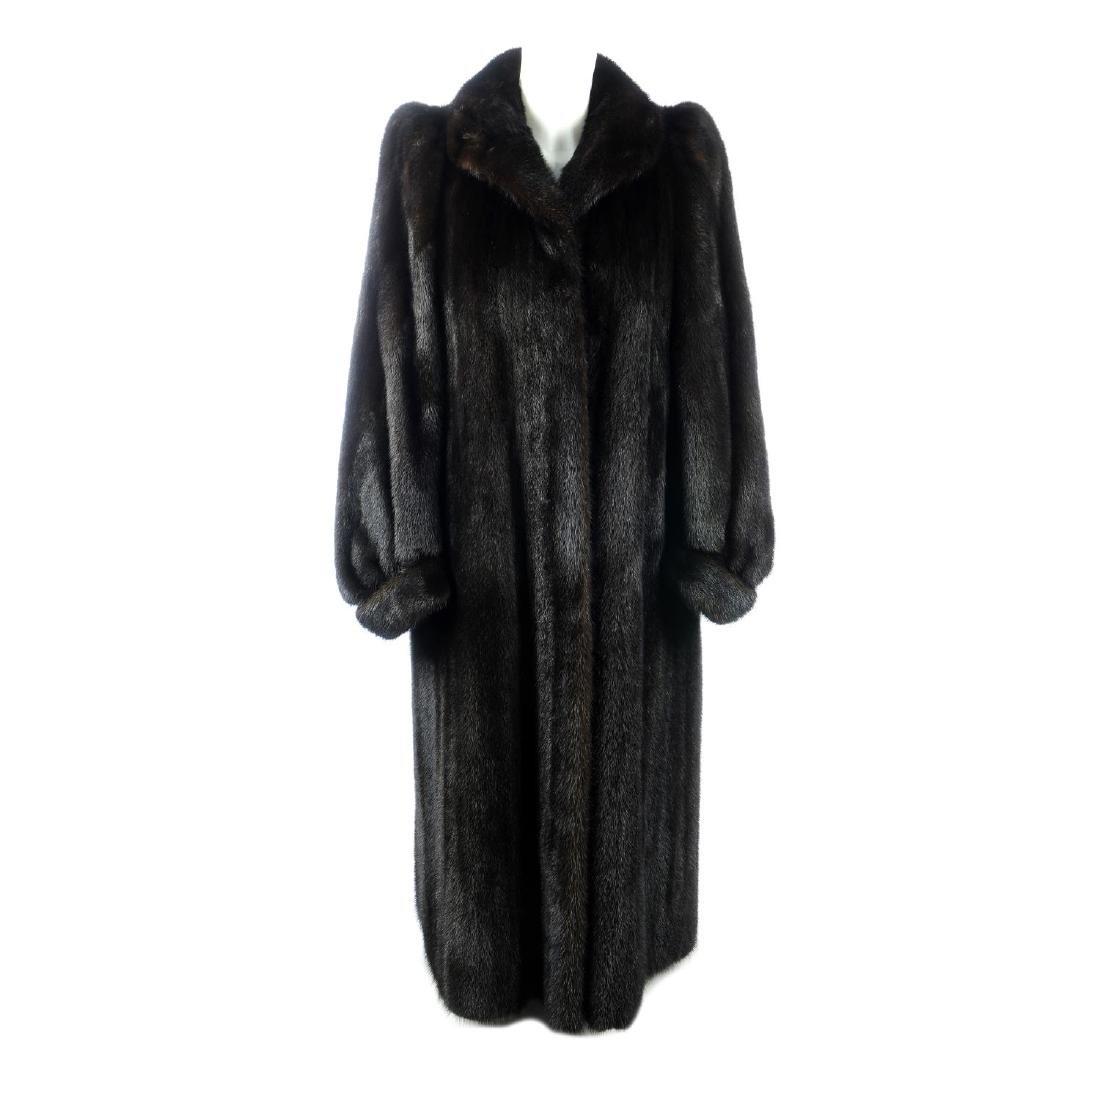 A dark ranch mink full-length coat. Featuring a lapel